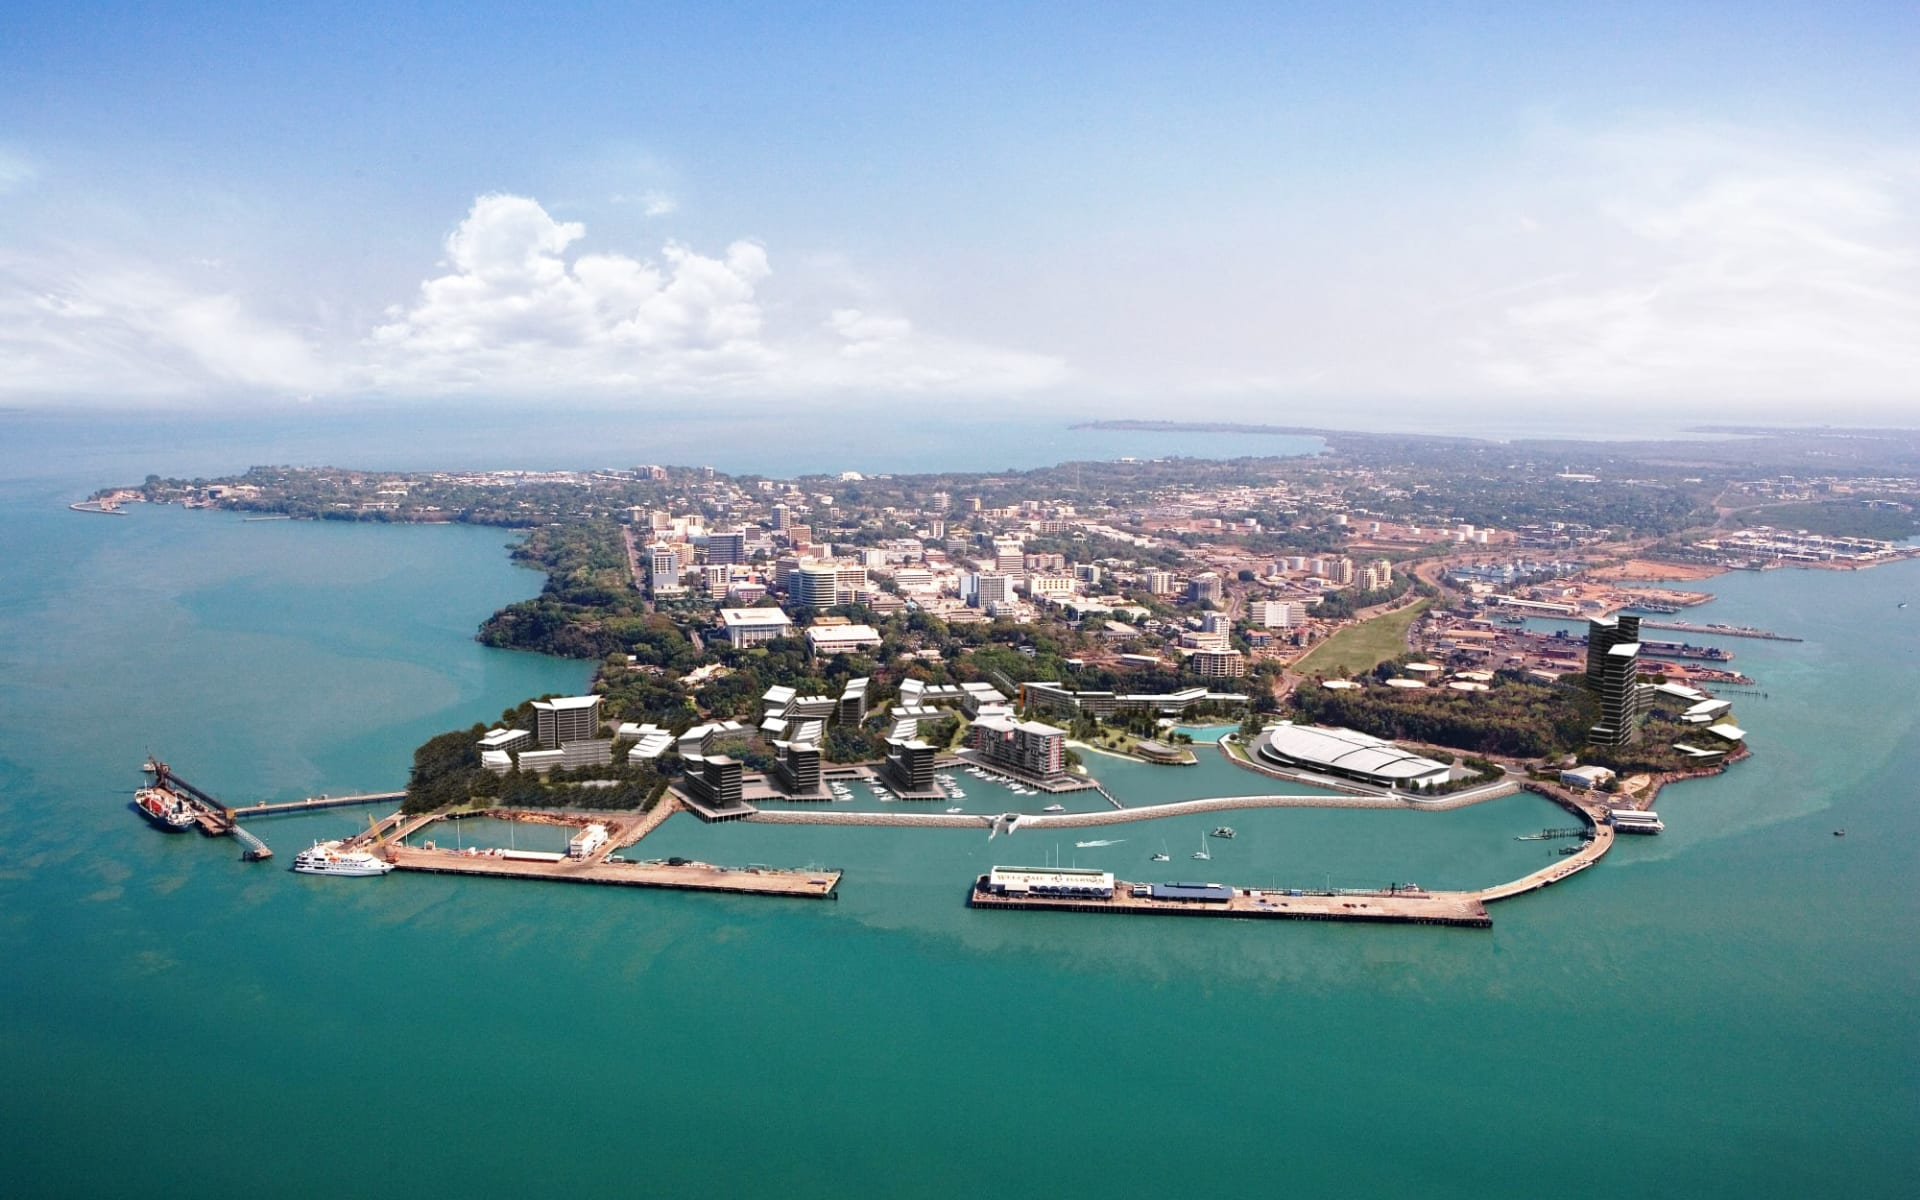 Kaleidoskop Australien (AAT Kings) ab Melbourne: Australia - Northern Territory - Darwin - Waterfront